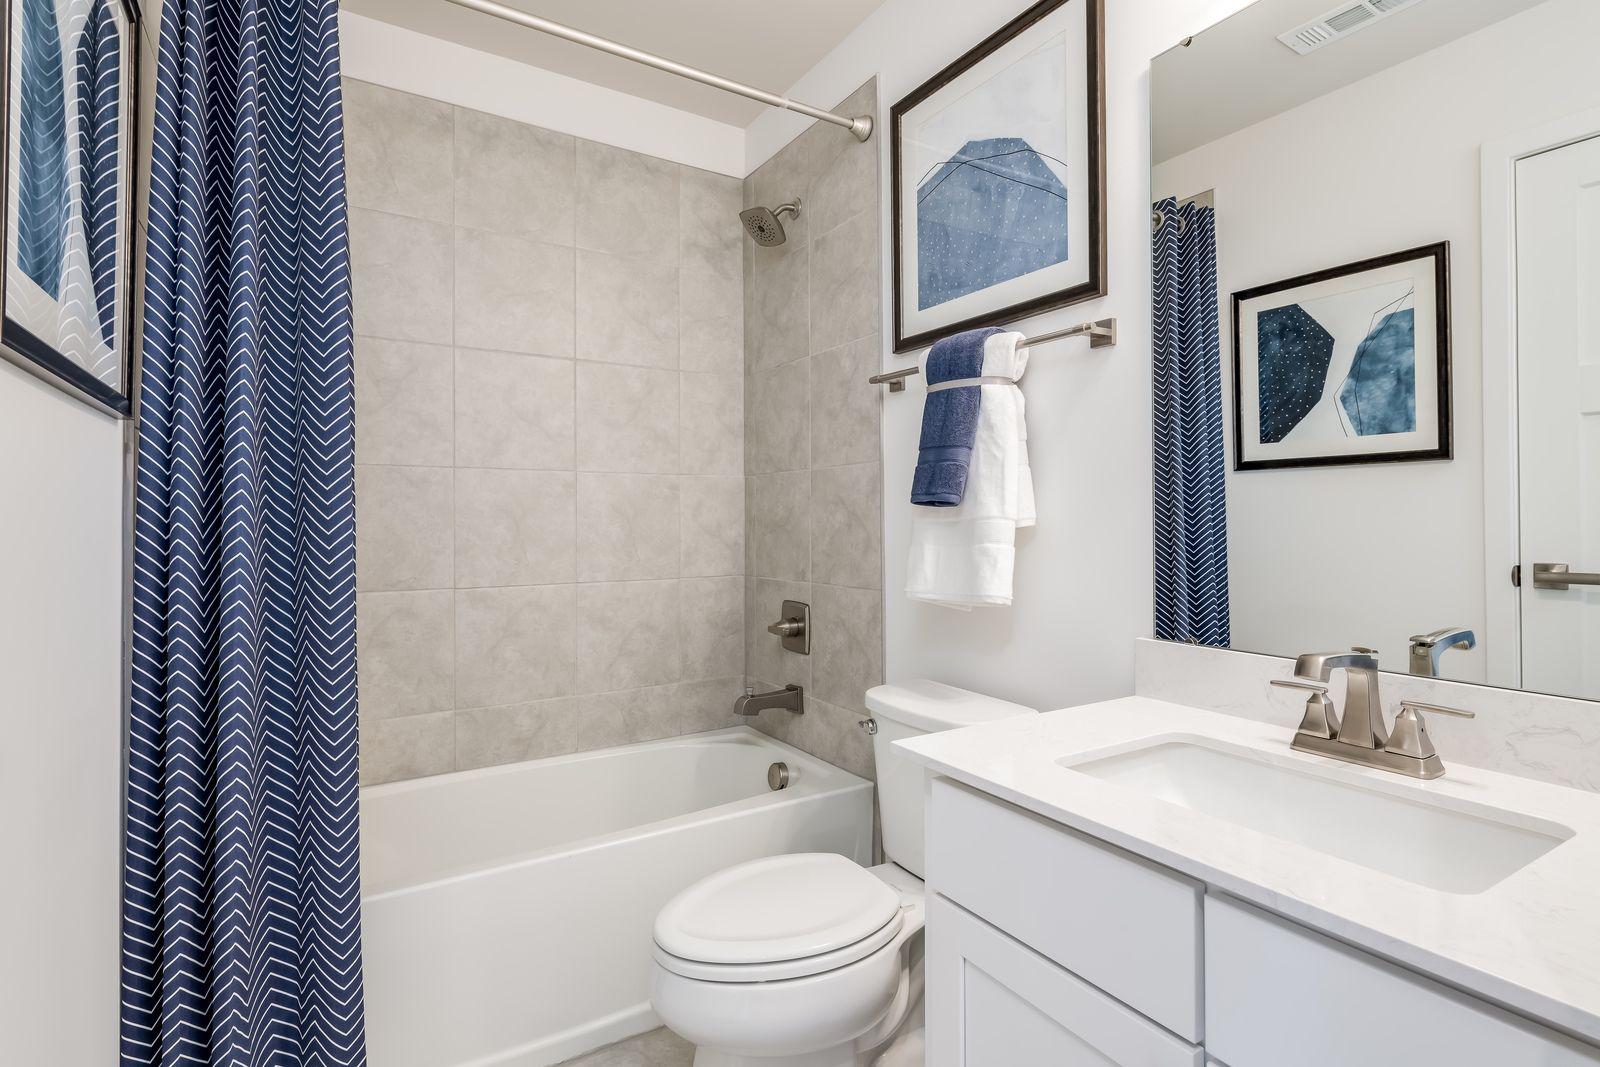 Bathroom featured in the Mendelssohn Rear Garage By Ryan Homes in Washington, MD